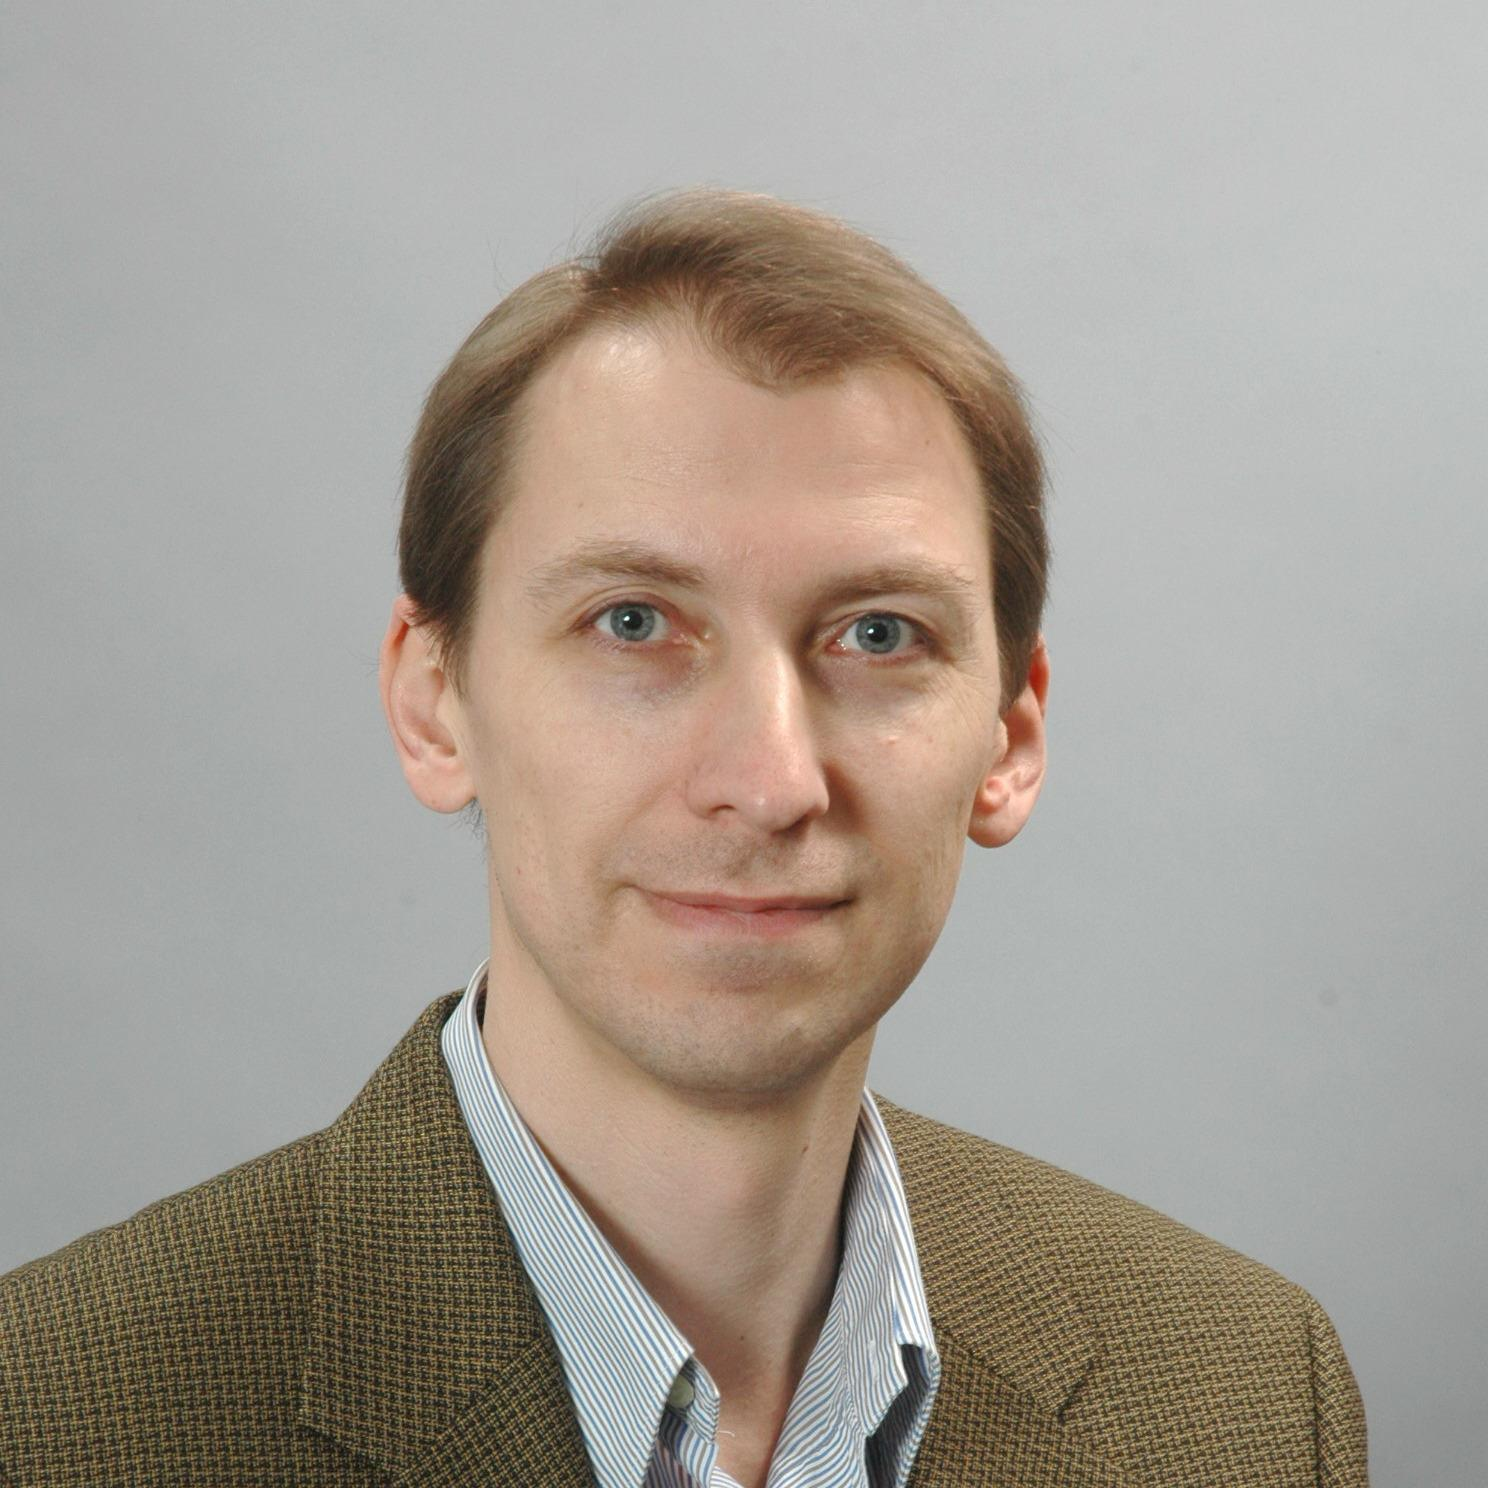 Андрій Мурзін